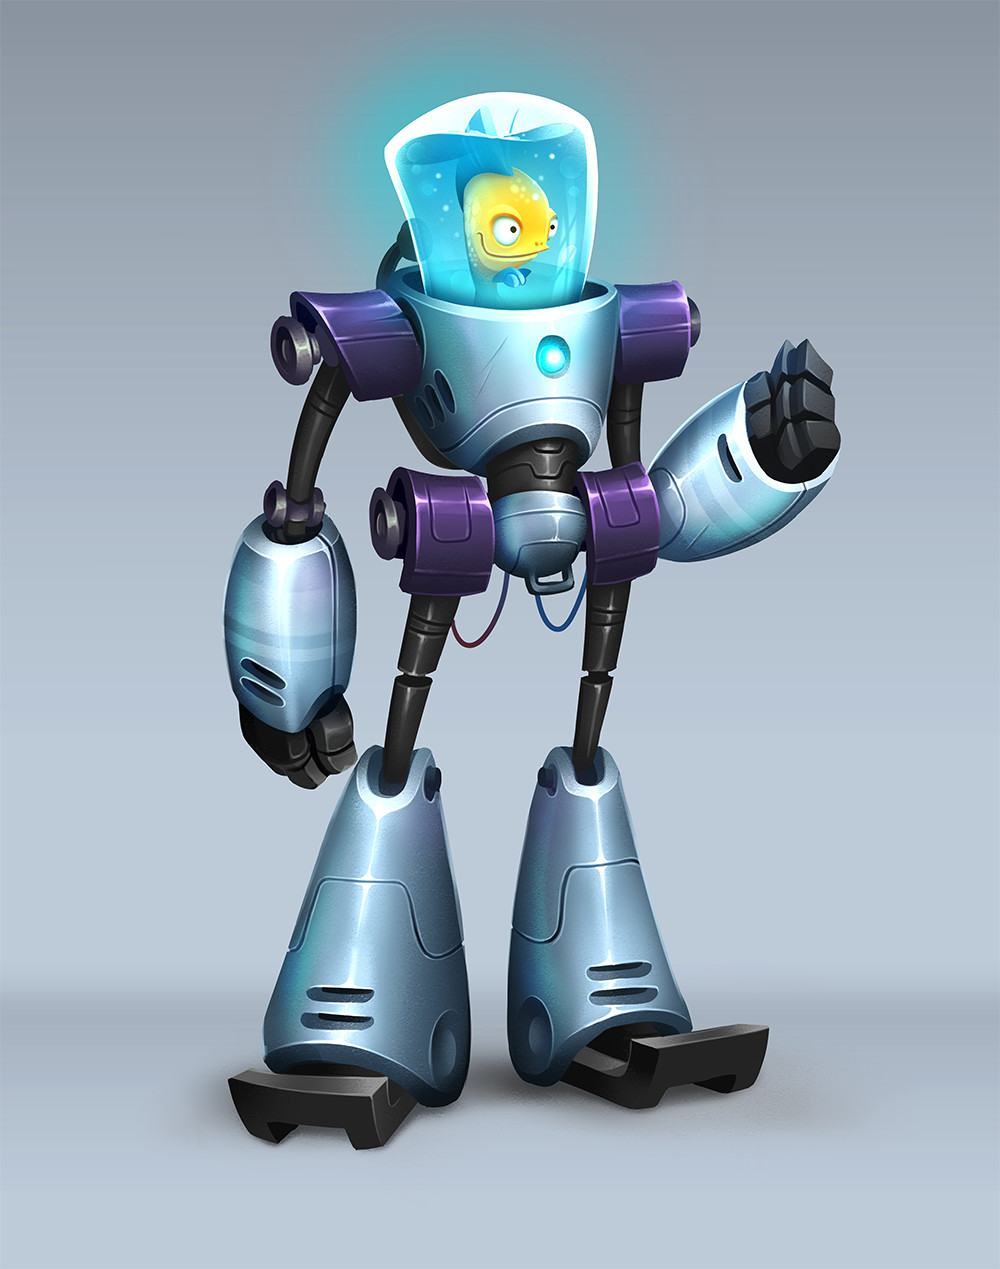 Josh bruce bionic robofish